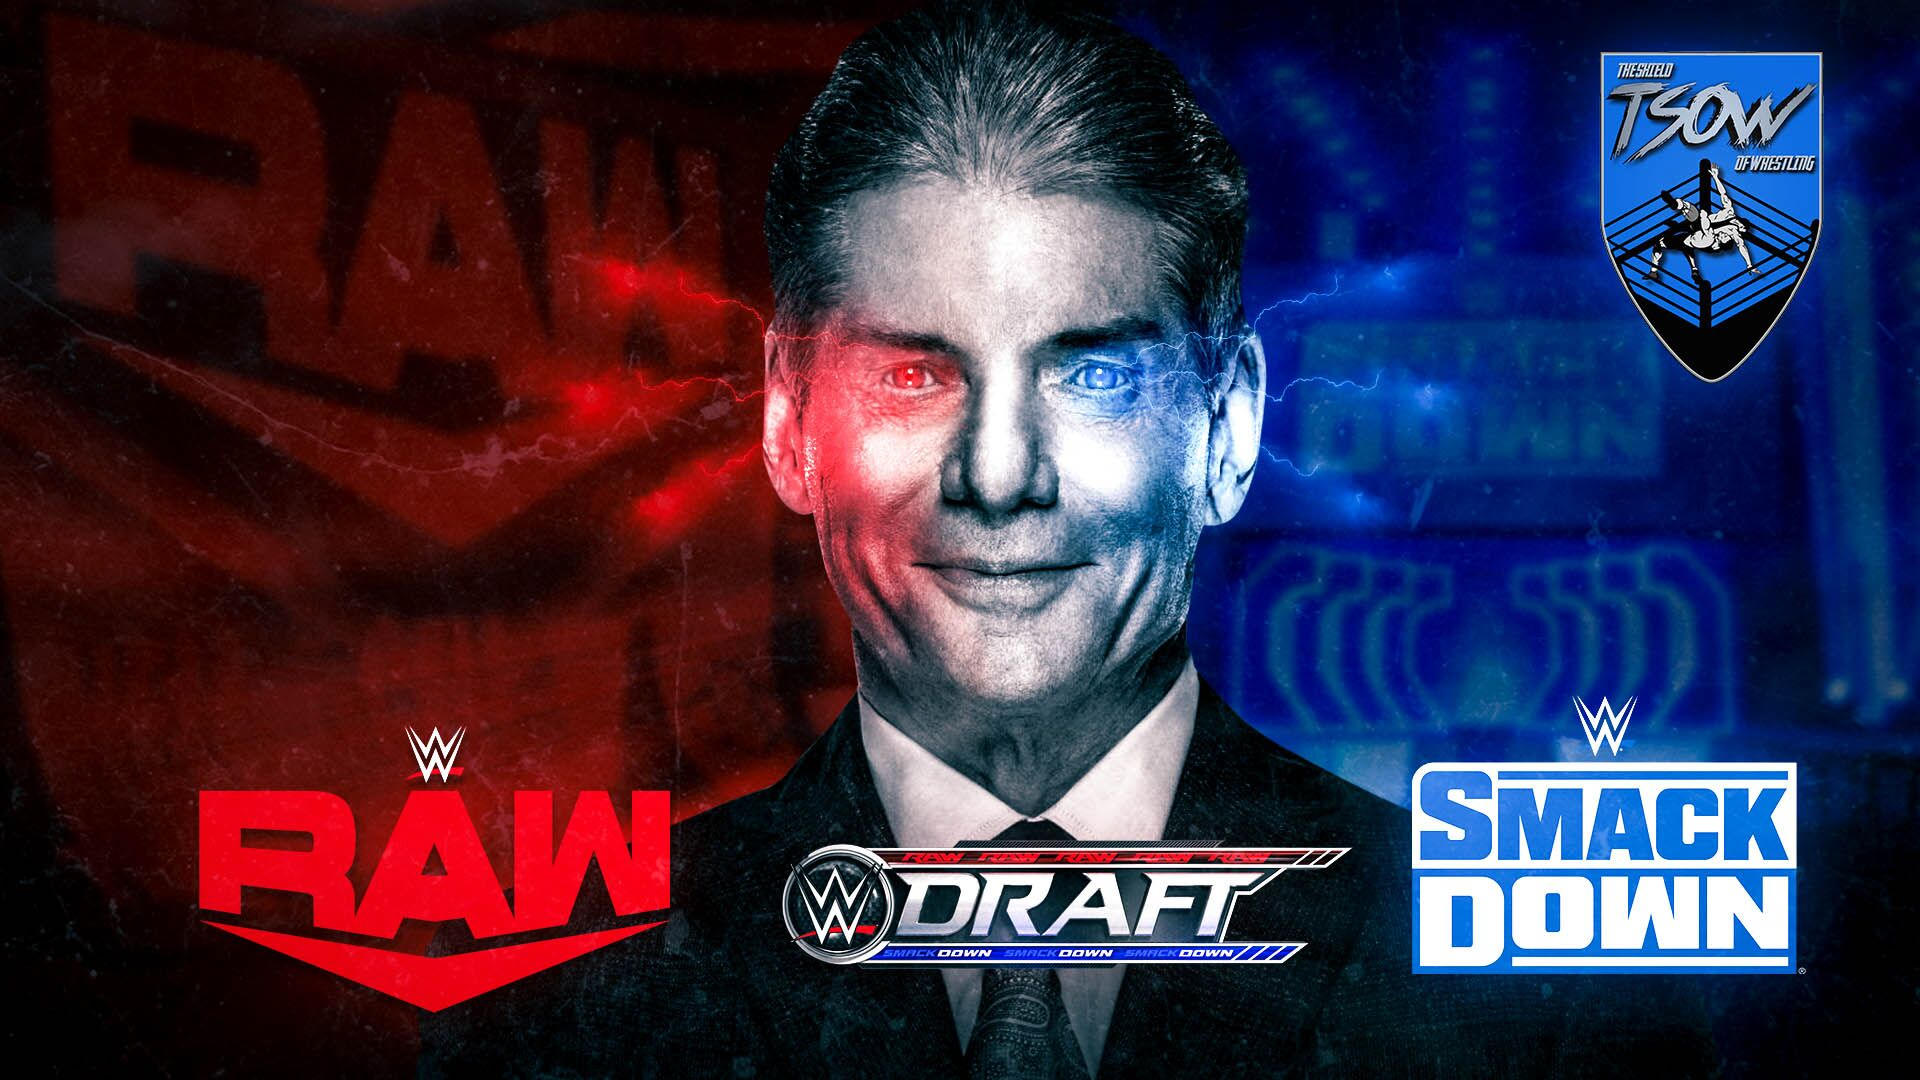 Draft durante RAW